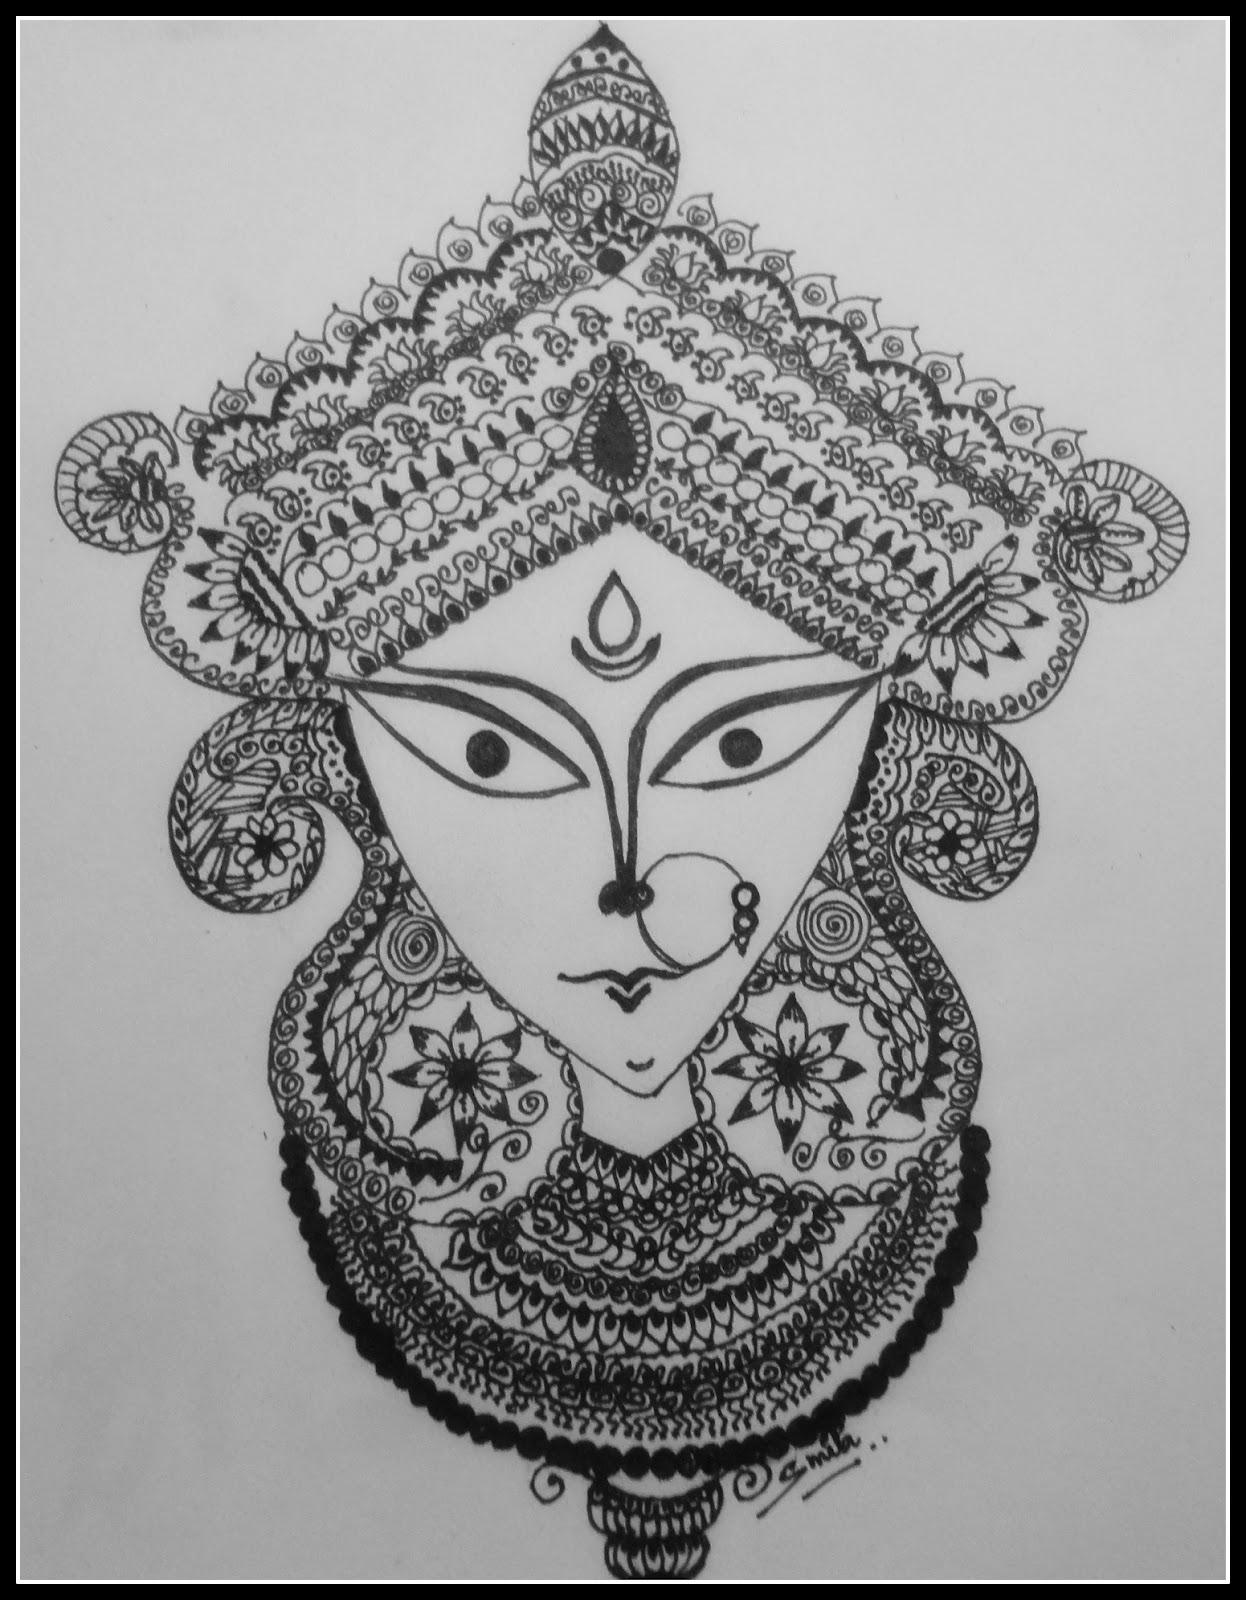 Durga maa sketch studio